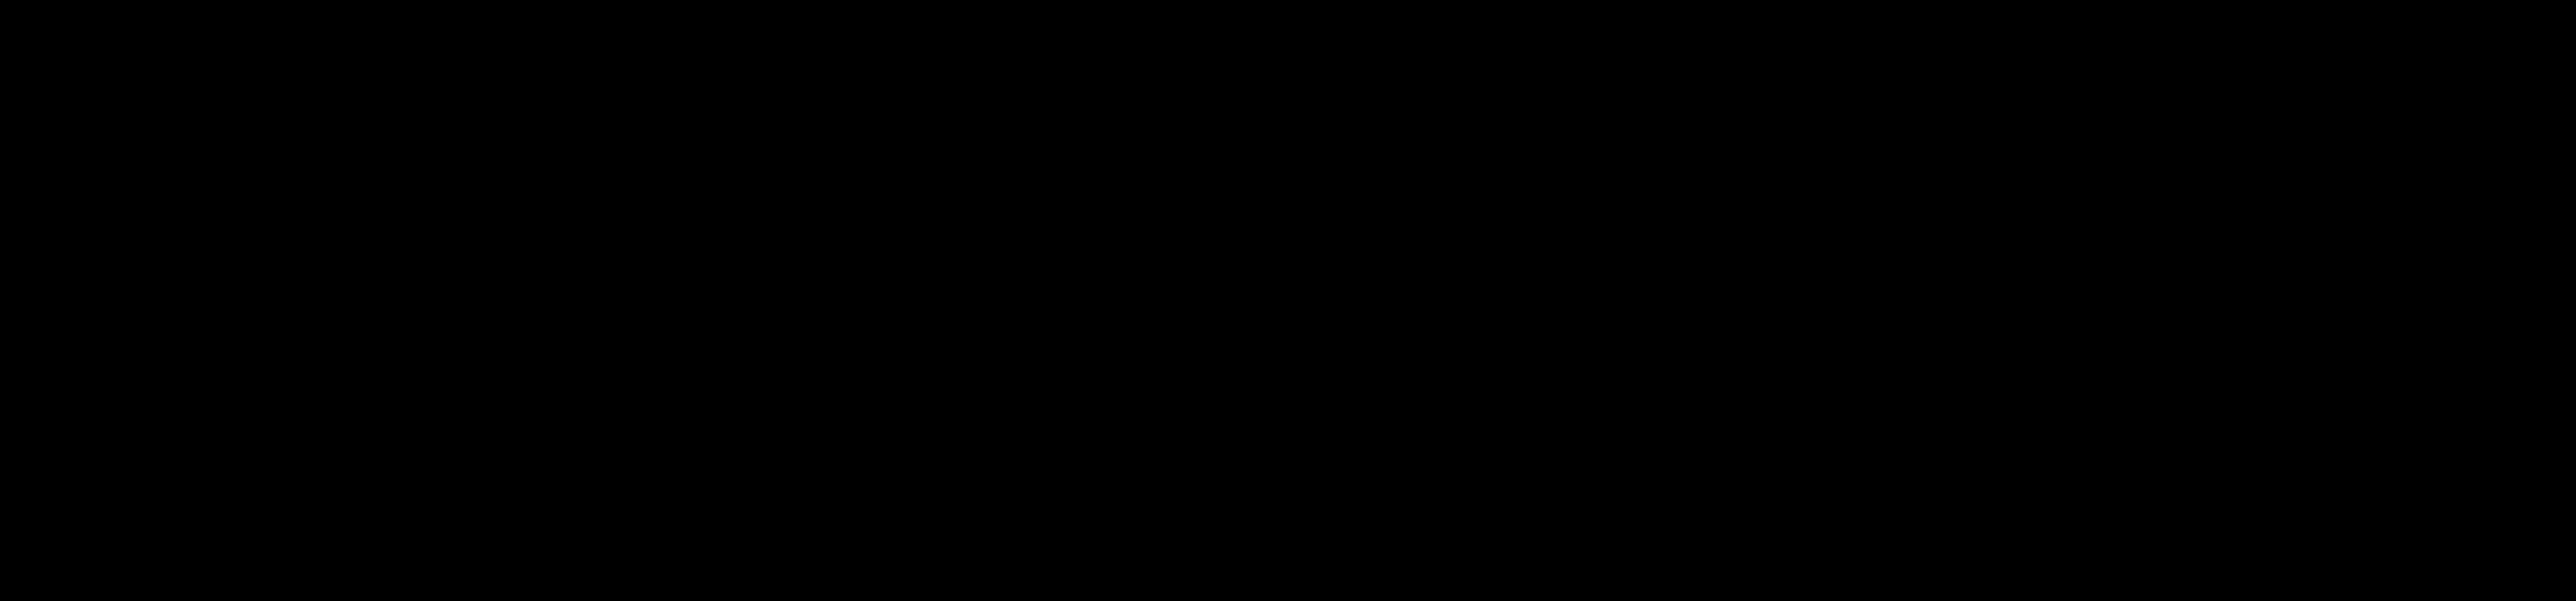 hdmi logo 2 - HDMI Logo